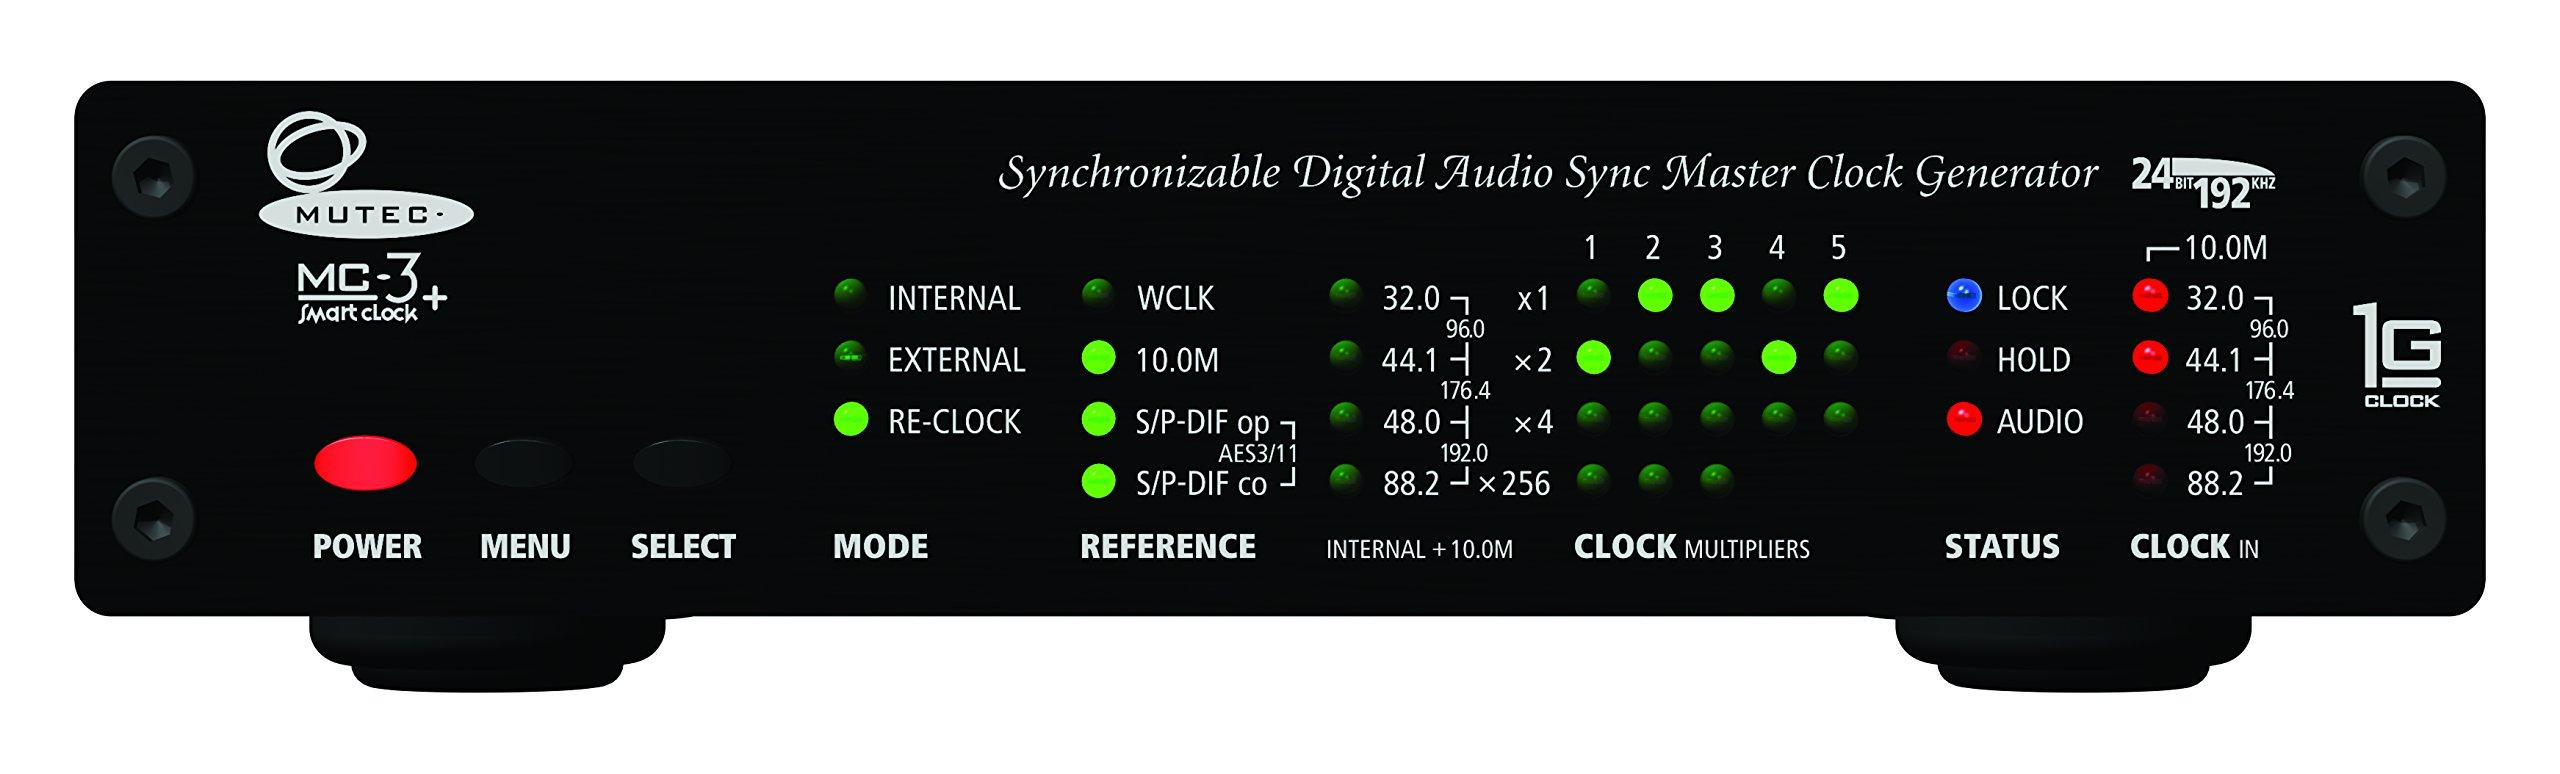 Mutec MC-3+ Smart Clock Audio Clock Generators Black